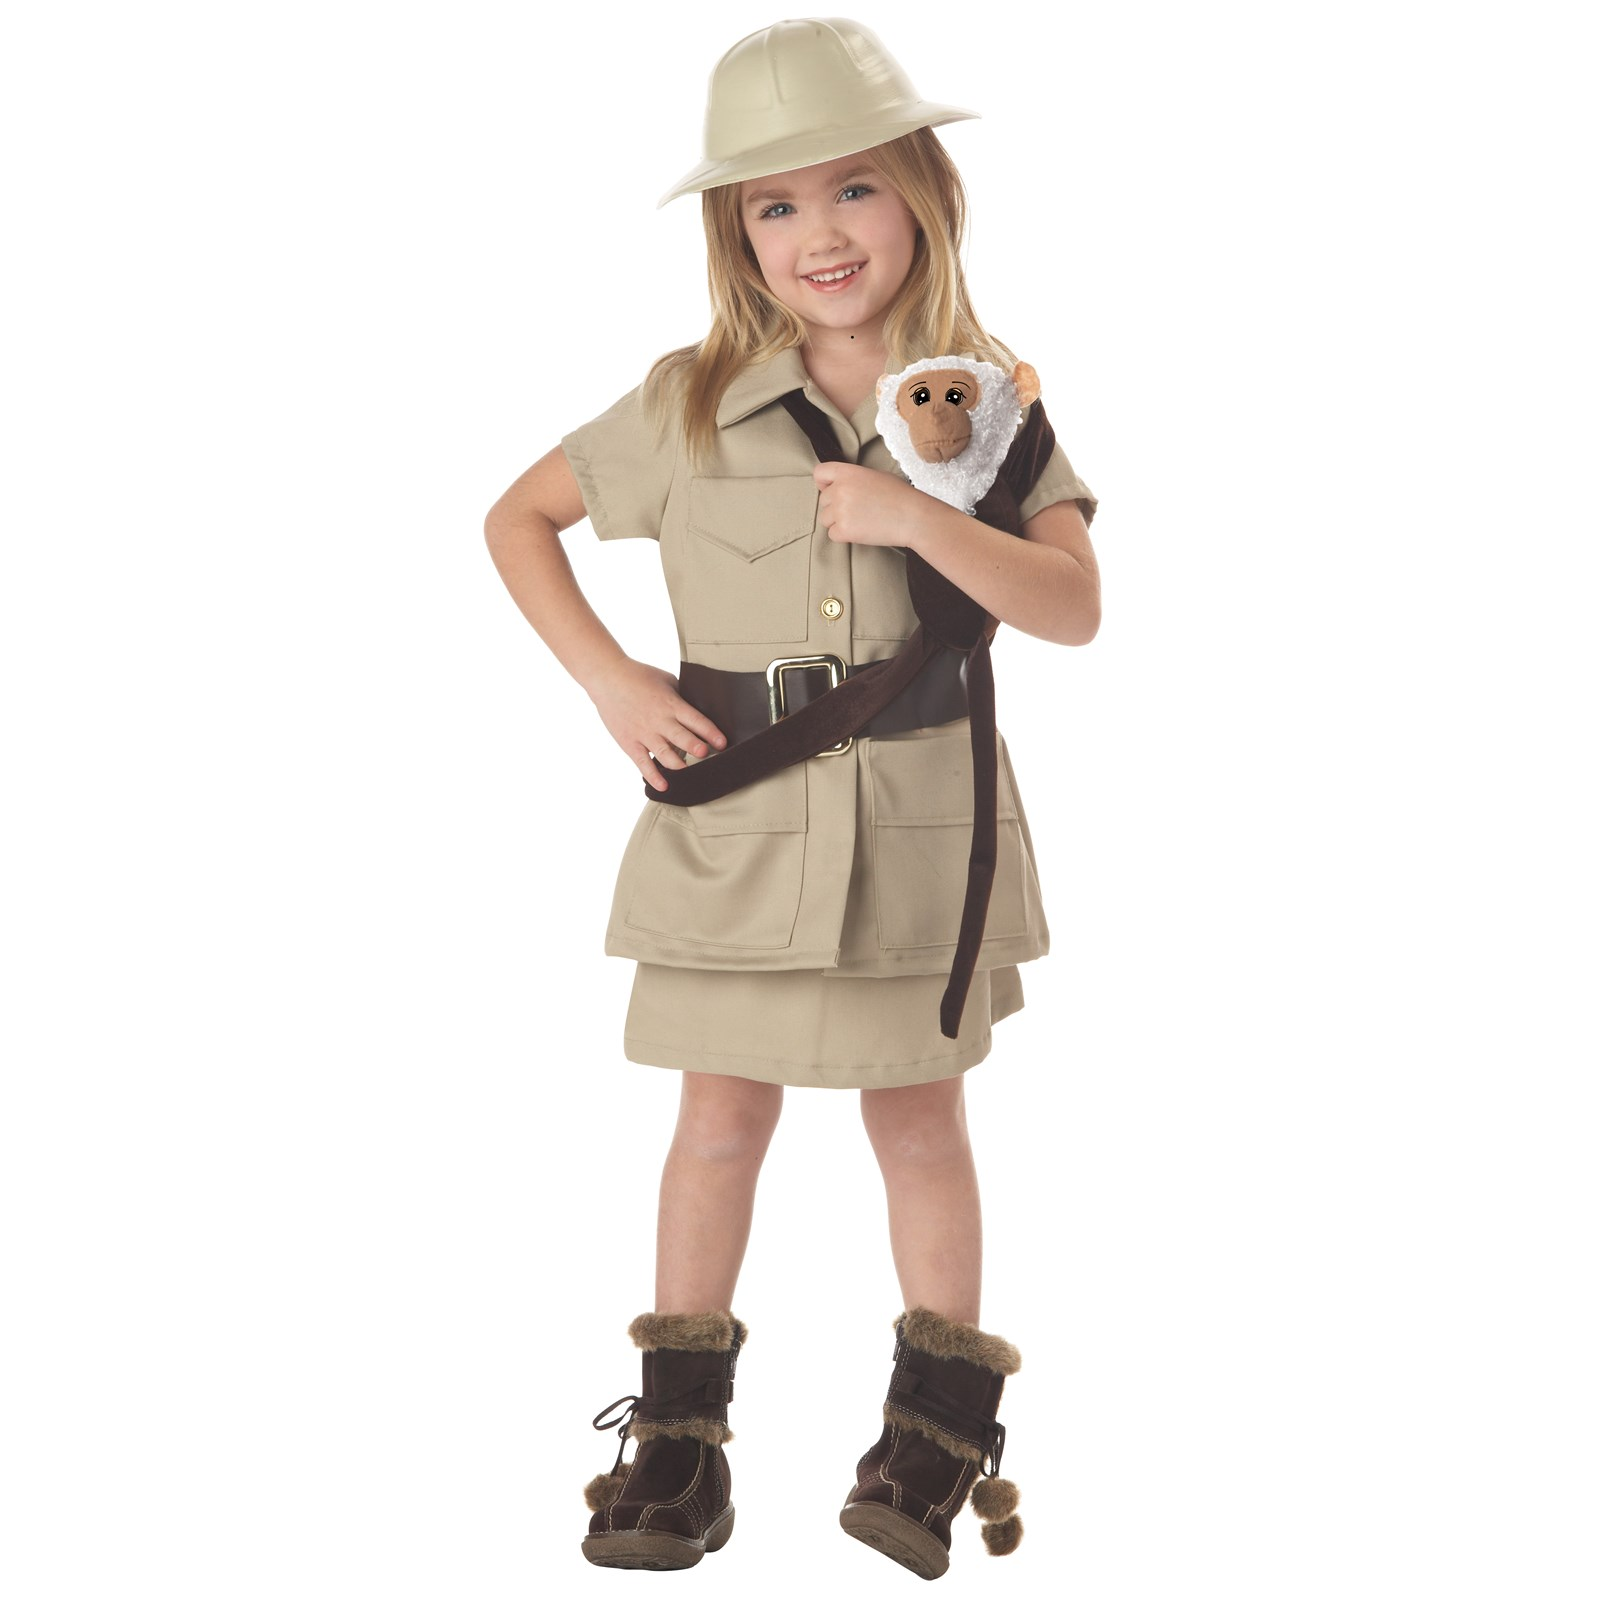 Zoo Keeper - Girl Child Costume   BuyCostumes.com